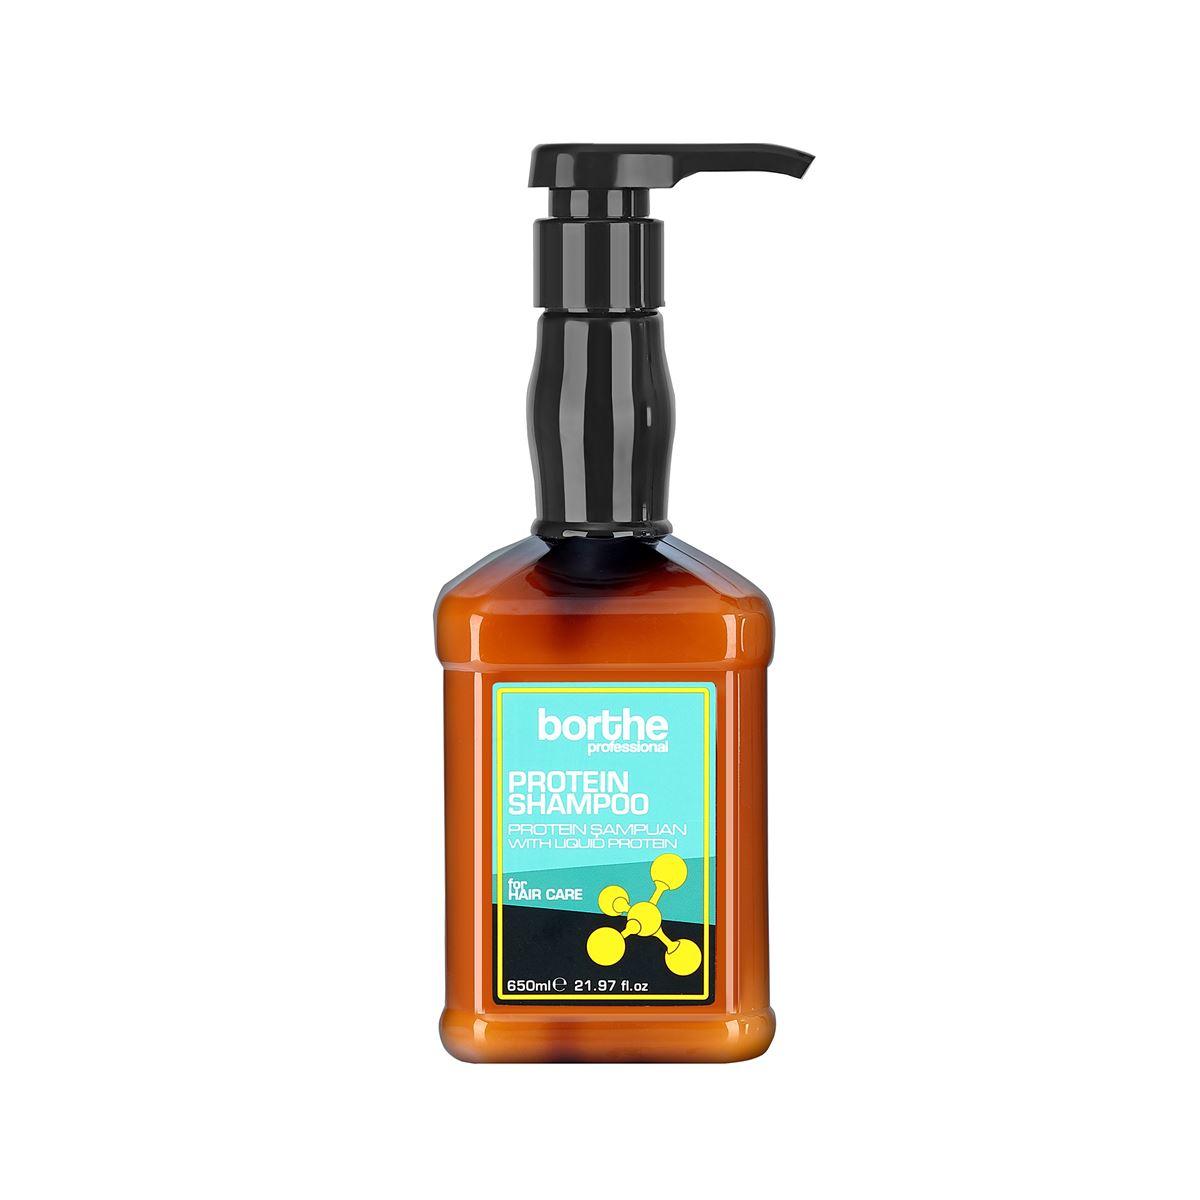 Borthe Protein Shampoo 650 ml.